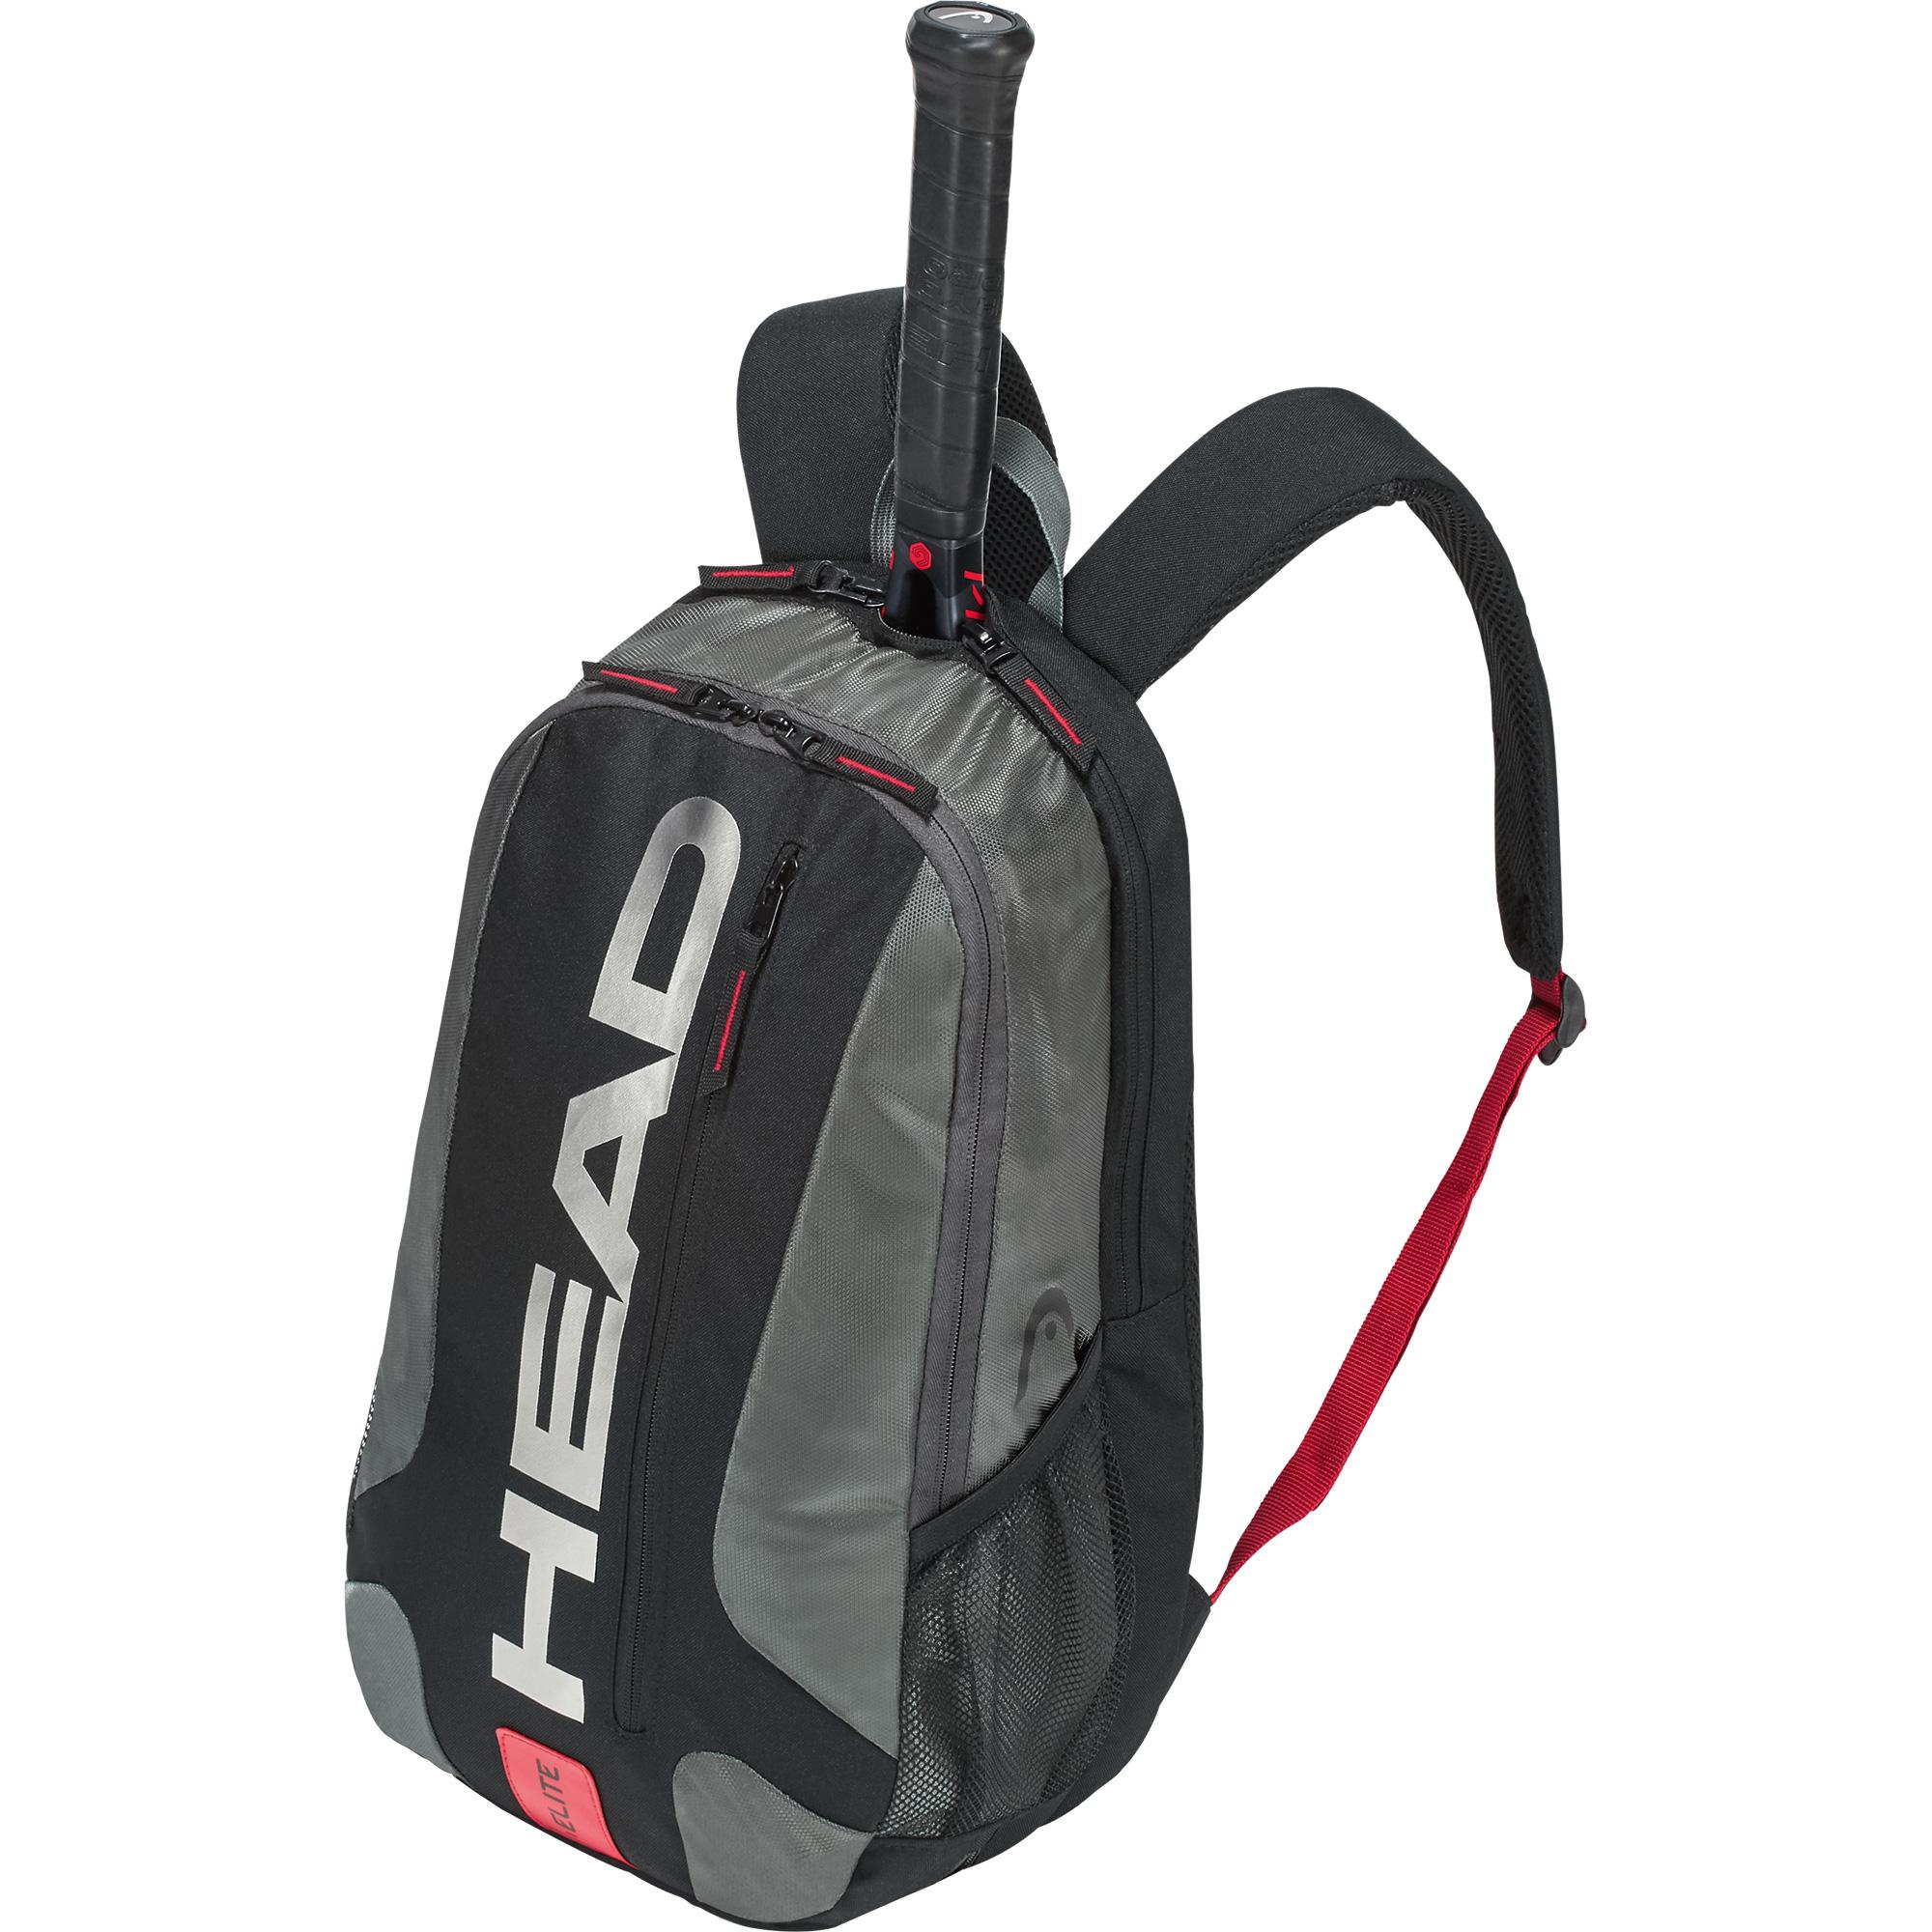 Head Elite Tennis Backpack (Black Red) - Do It Tennis 8ae3e567306eb